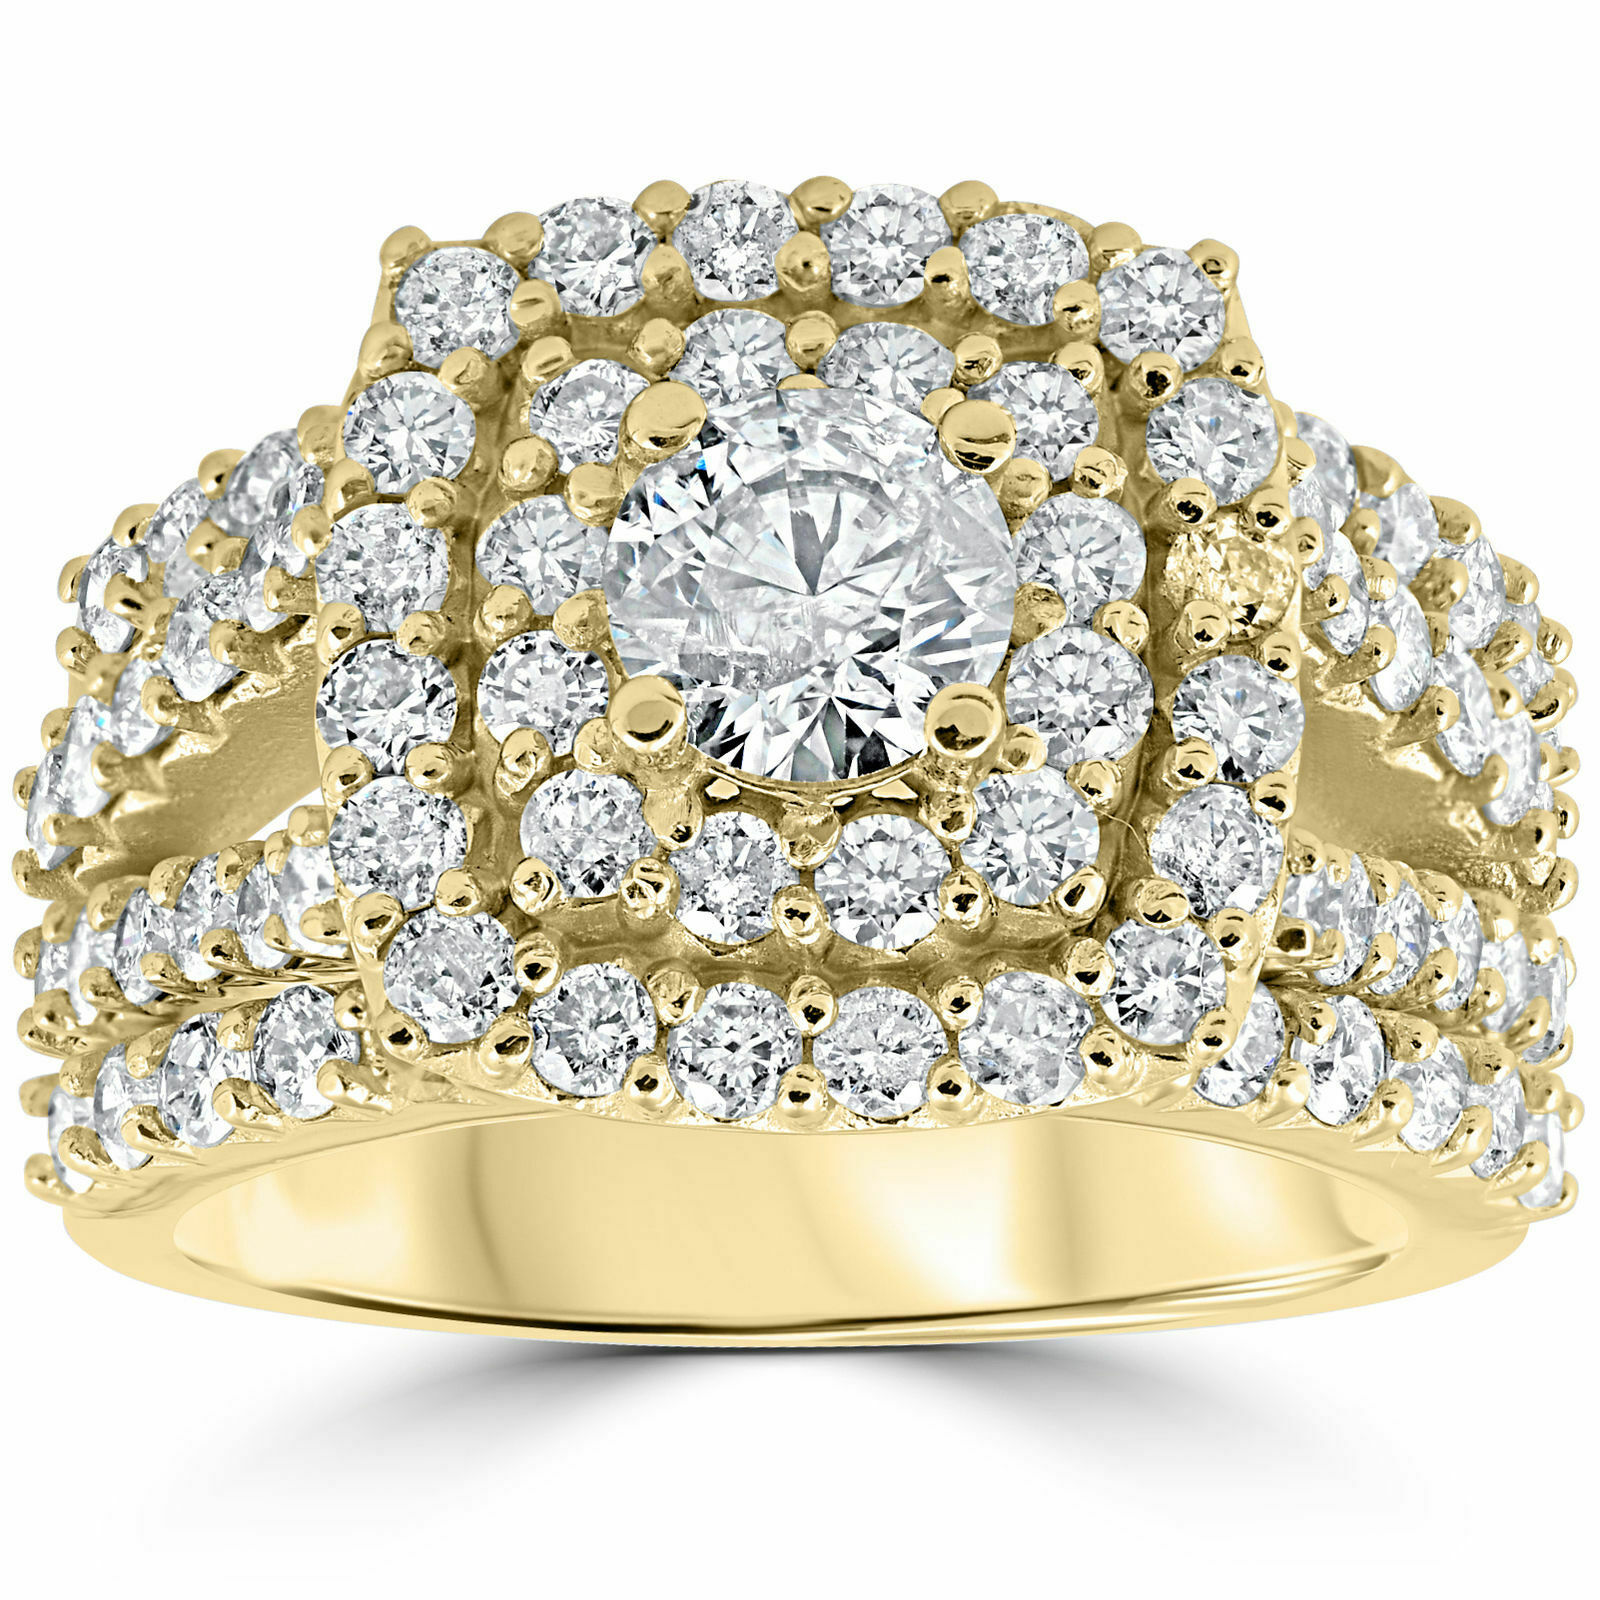 Real 10k Yellow gold Cushion Cut Diamond engagement wedding ring set